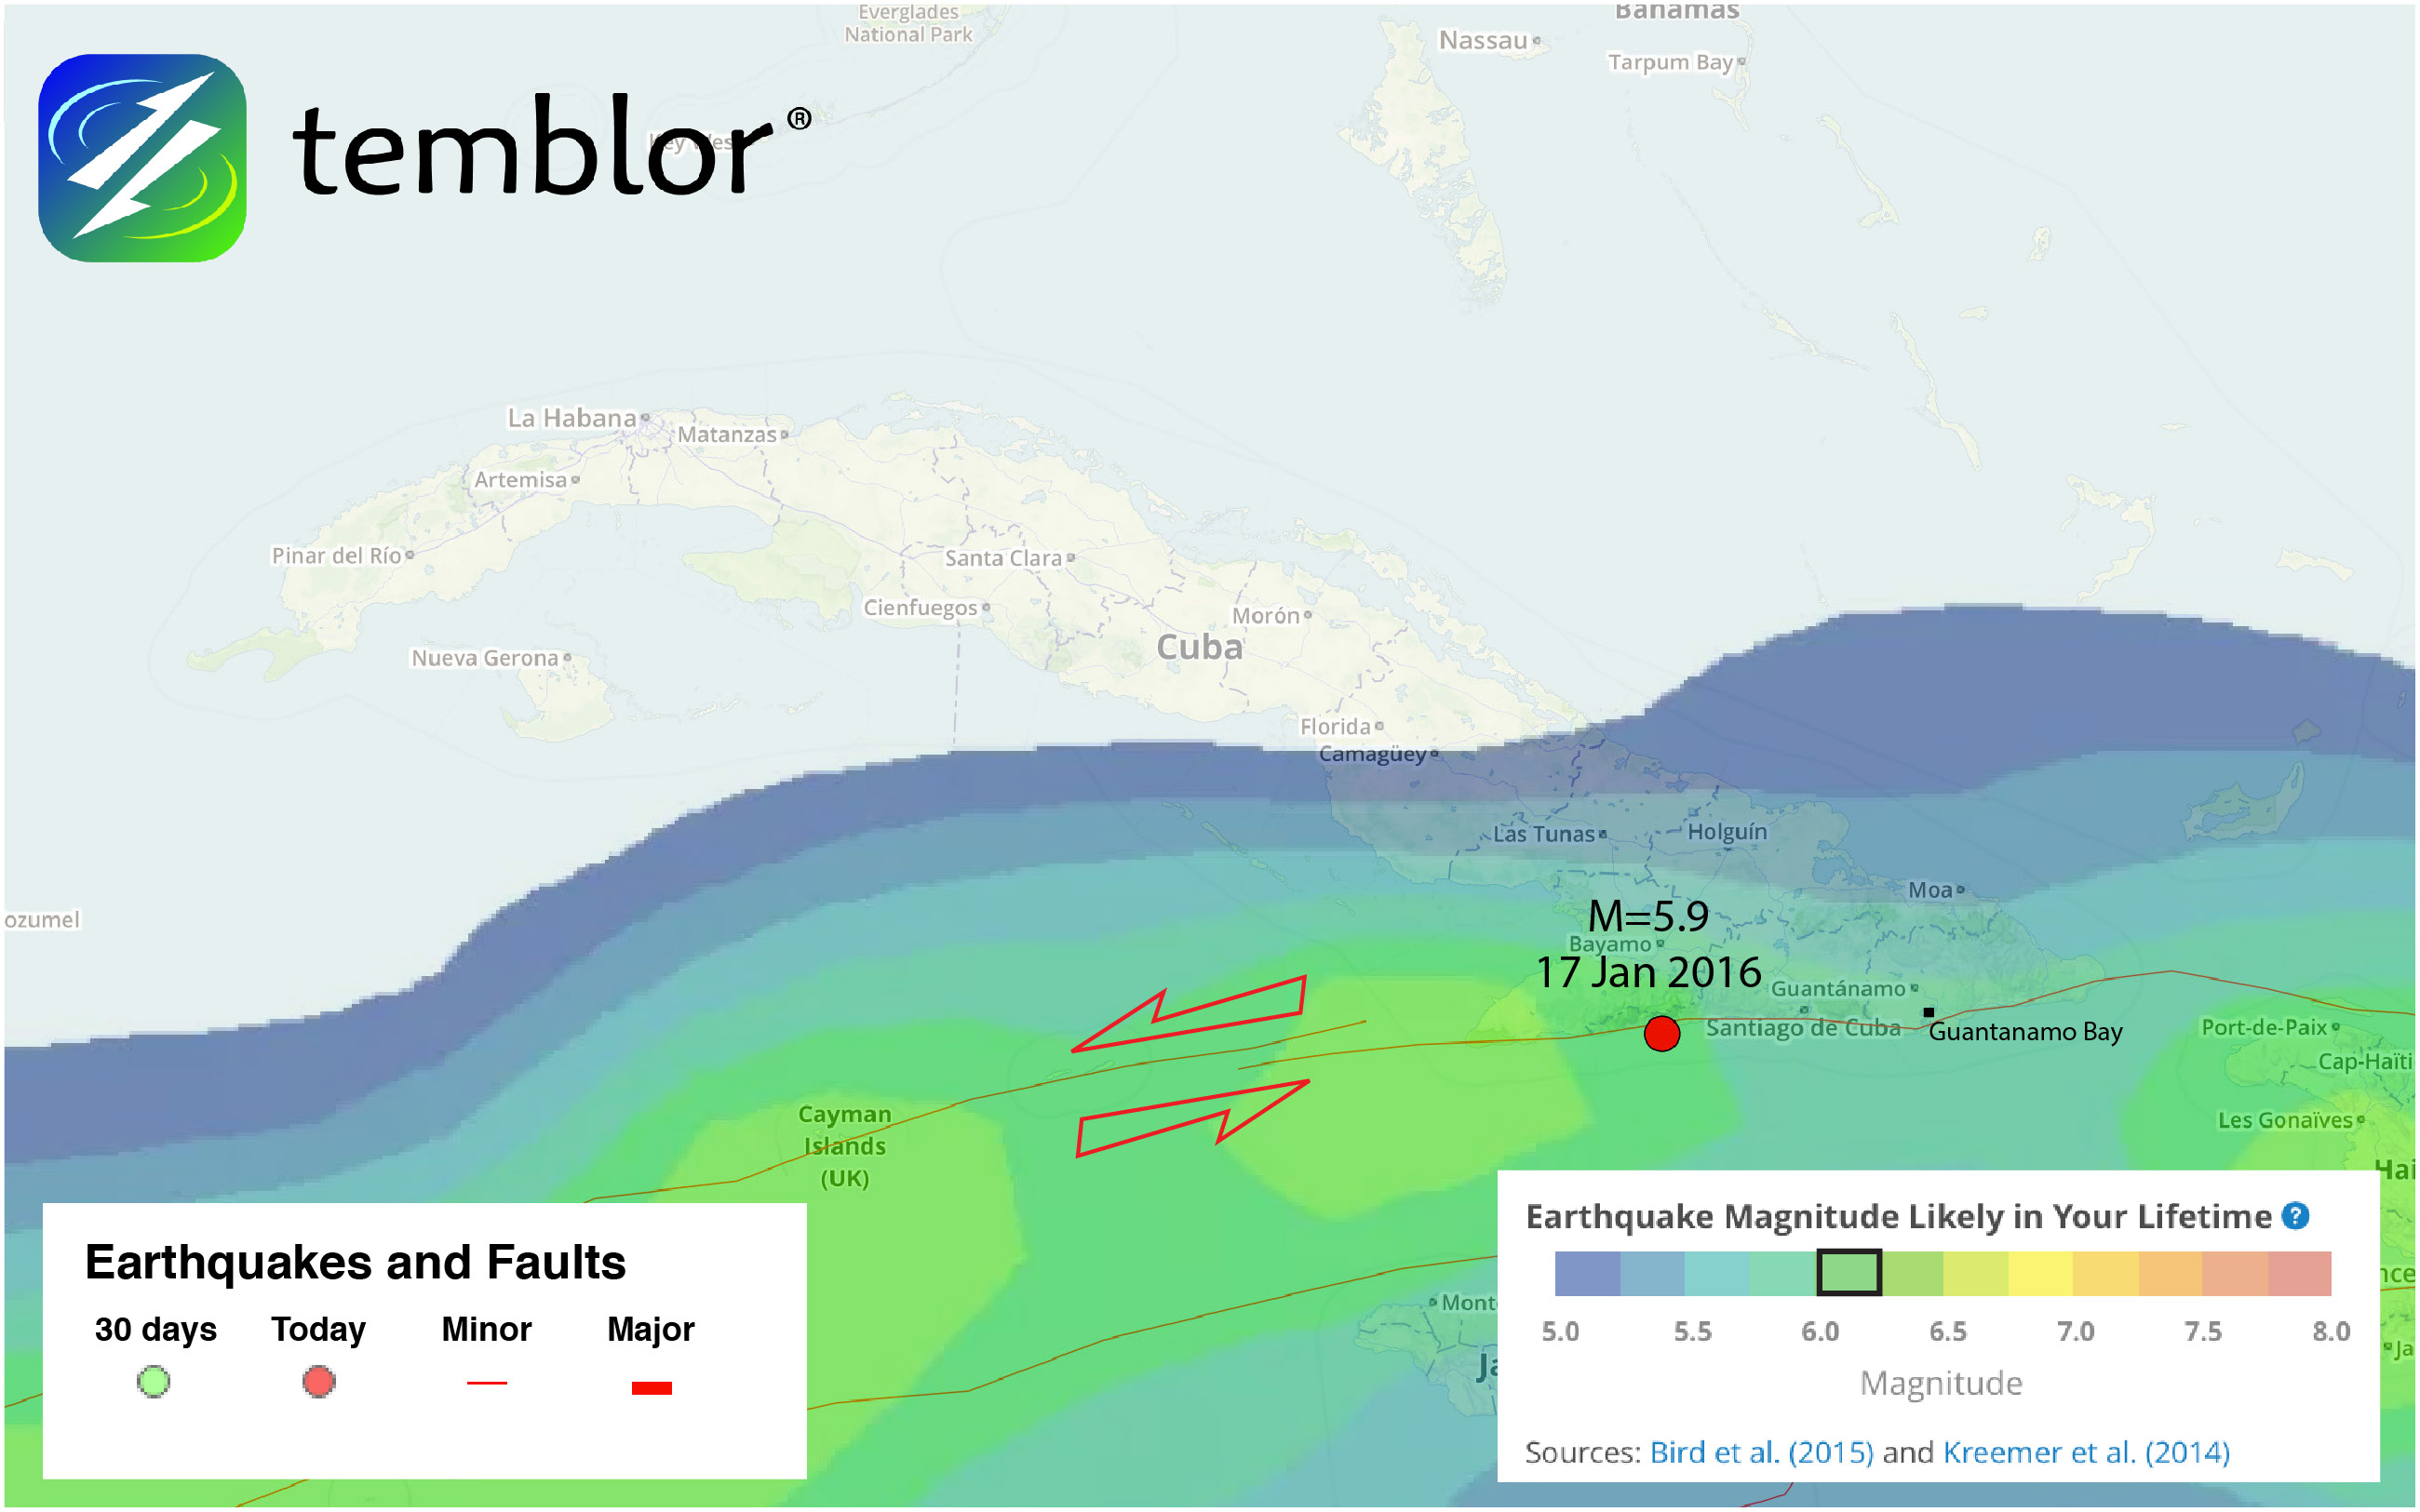 cuba-earthquake-map-cuba-fault-map-guantanamo-bay